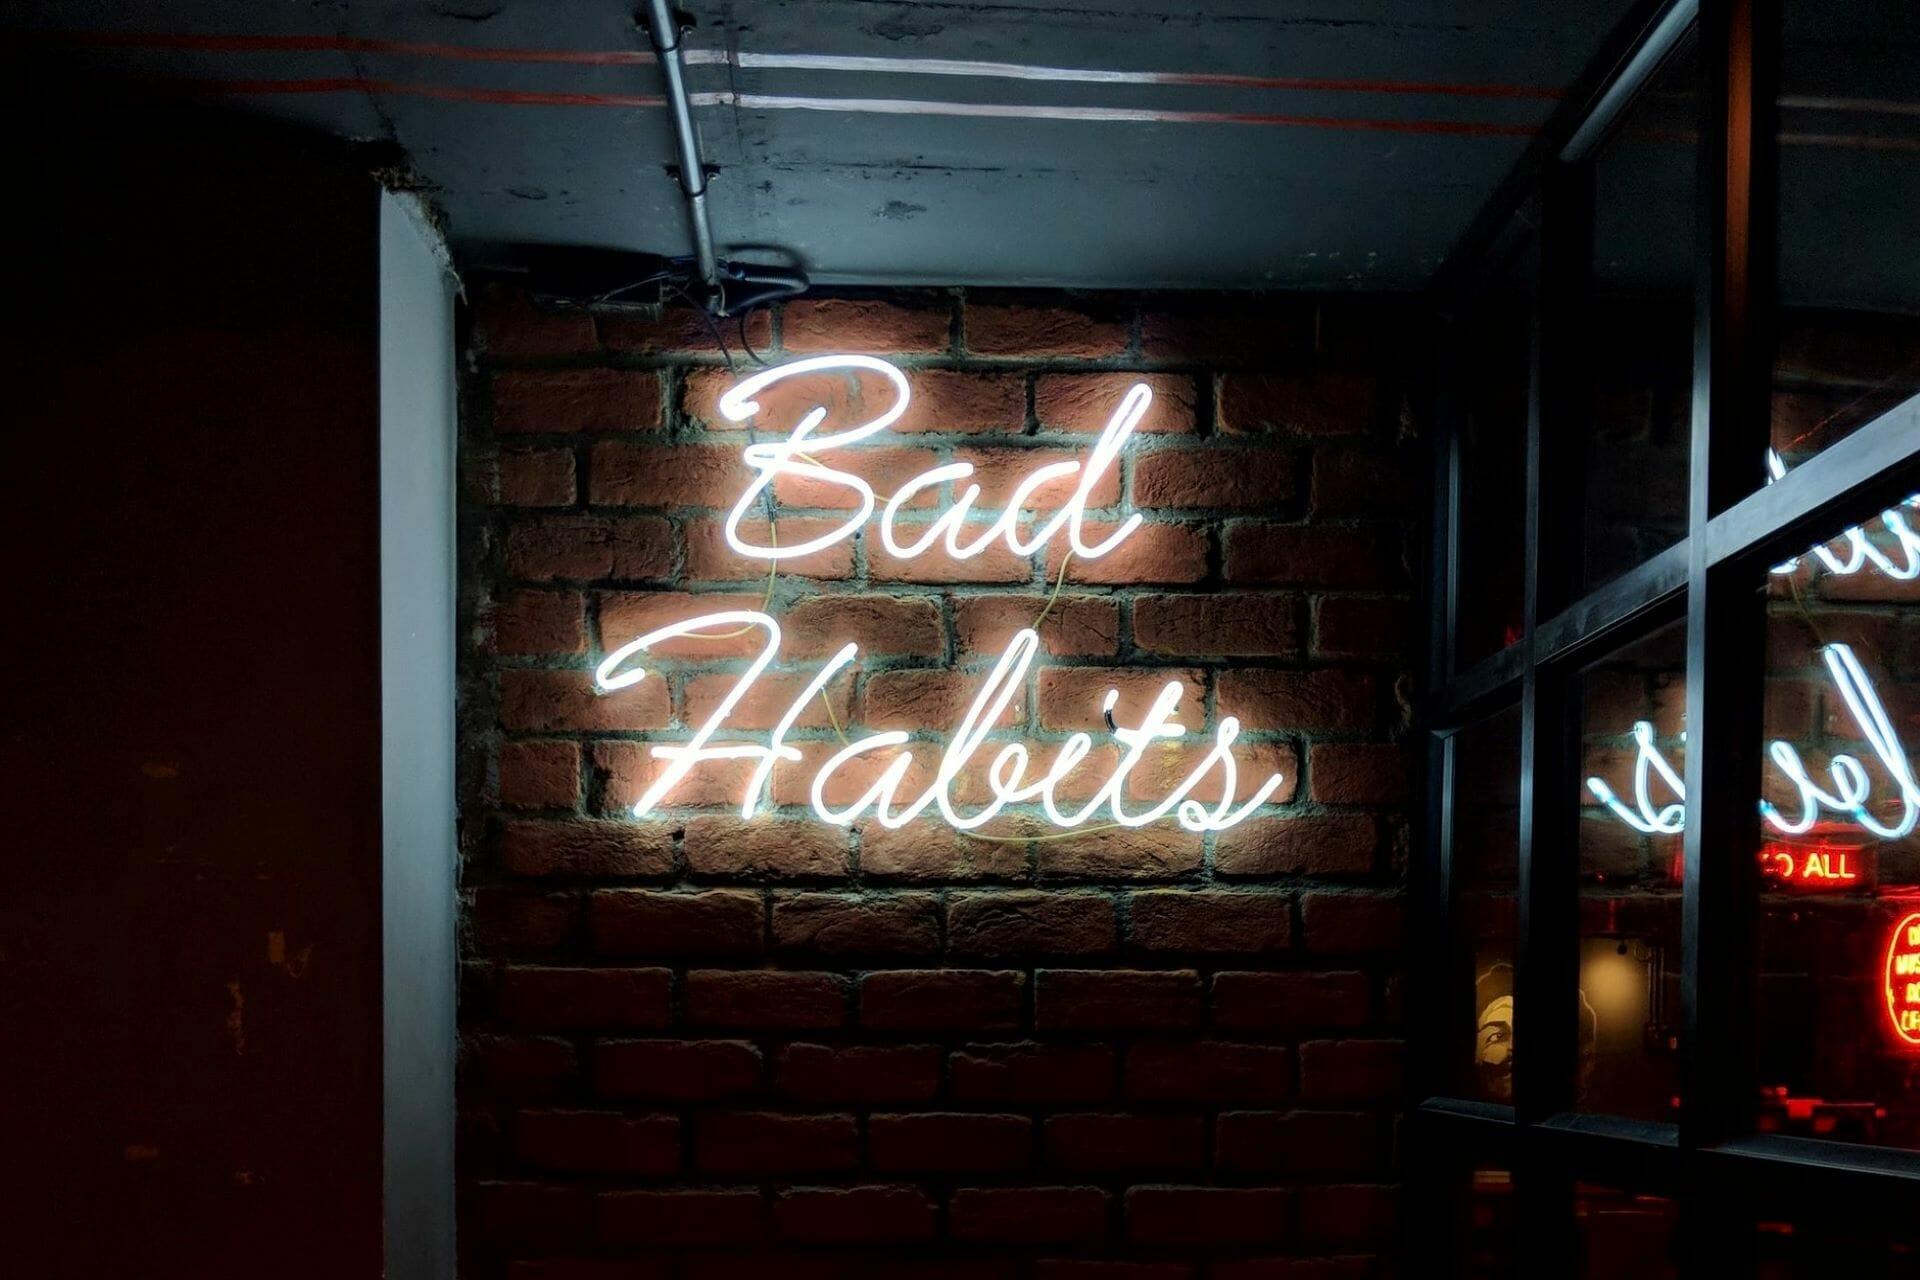 Ultimate List of Bad Habits: 8 Things to Avoid via @allamericanatlas